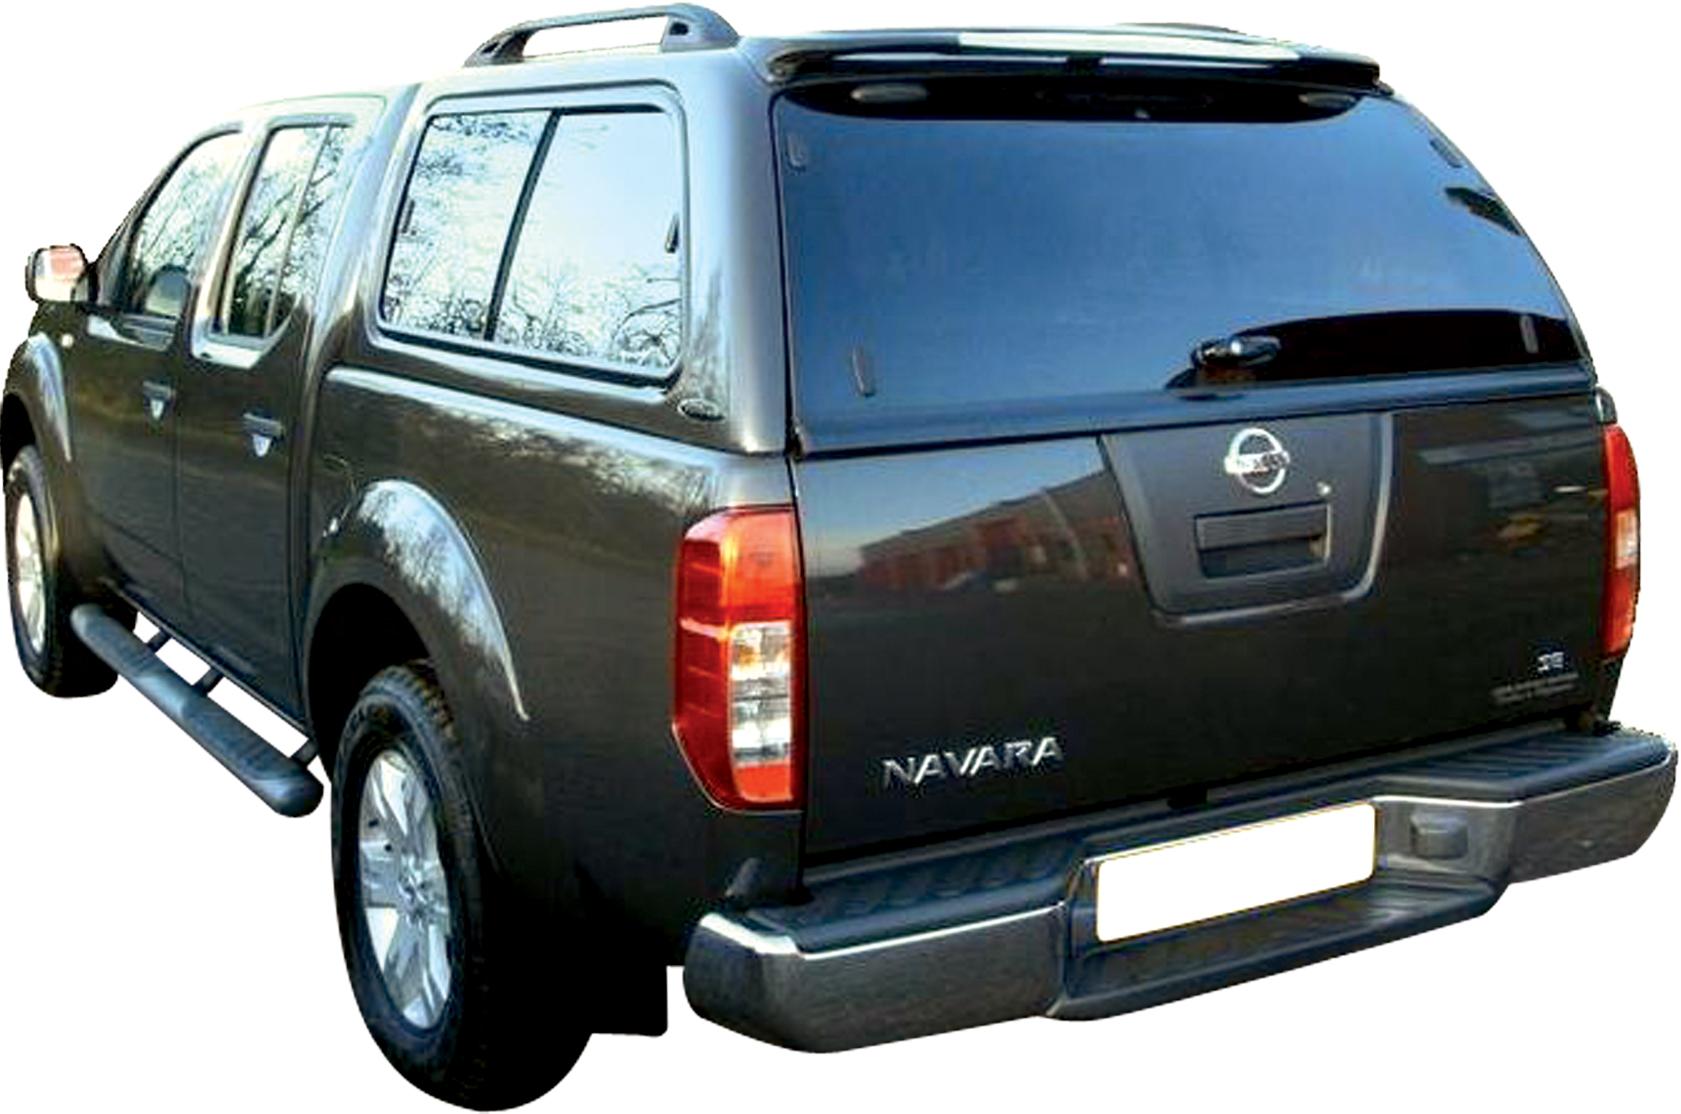 nk202 hard top carryboy nissan navara king cab 05 avec vitres nissan navara. Black Bedroom Furniture Sets. Home Design Ideas